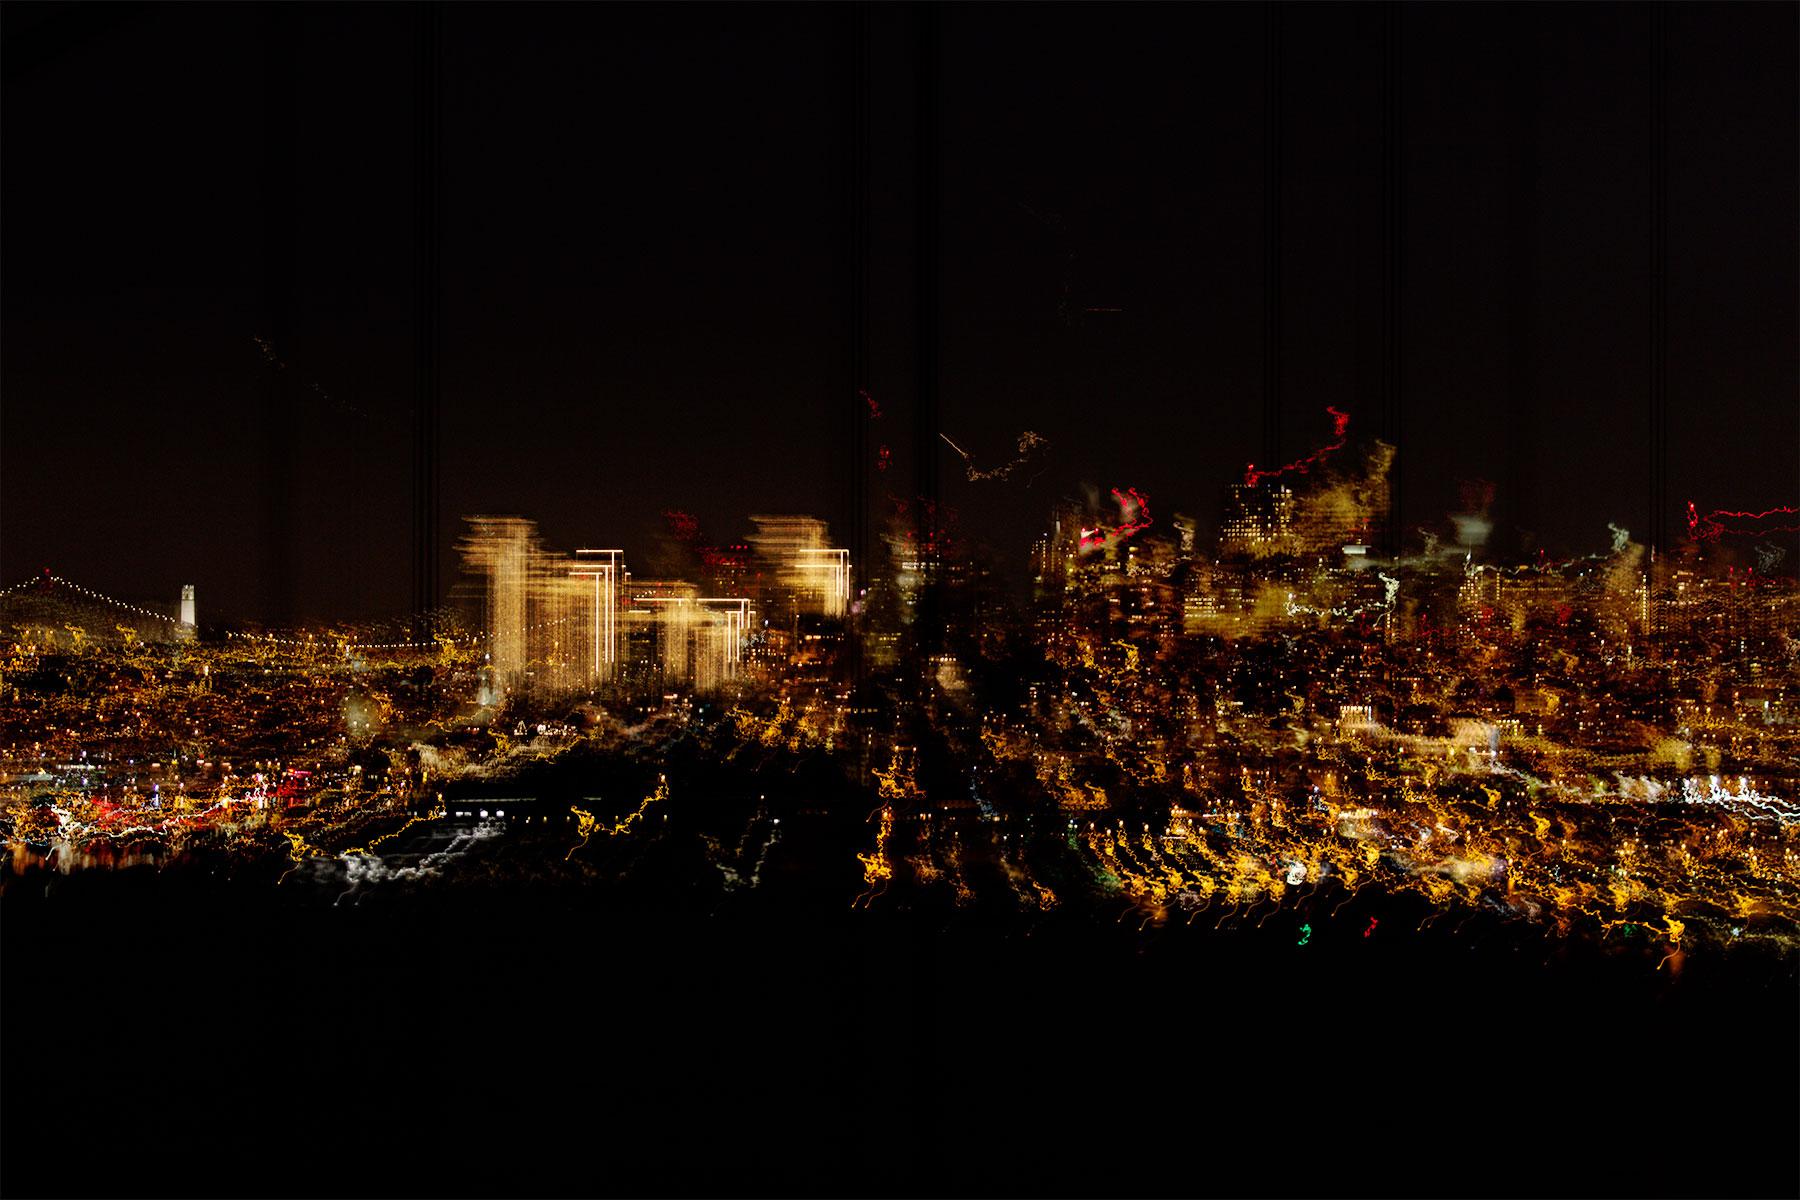 bonavida-sqr-golden-city-P2.jpg